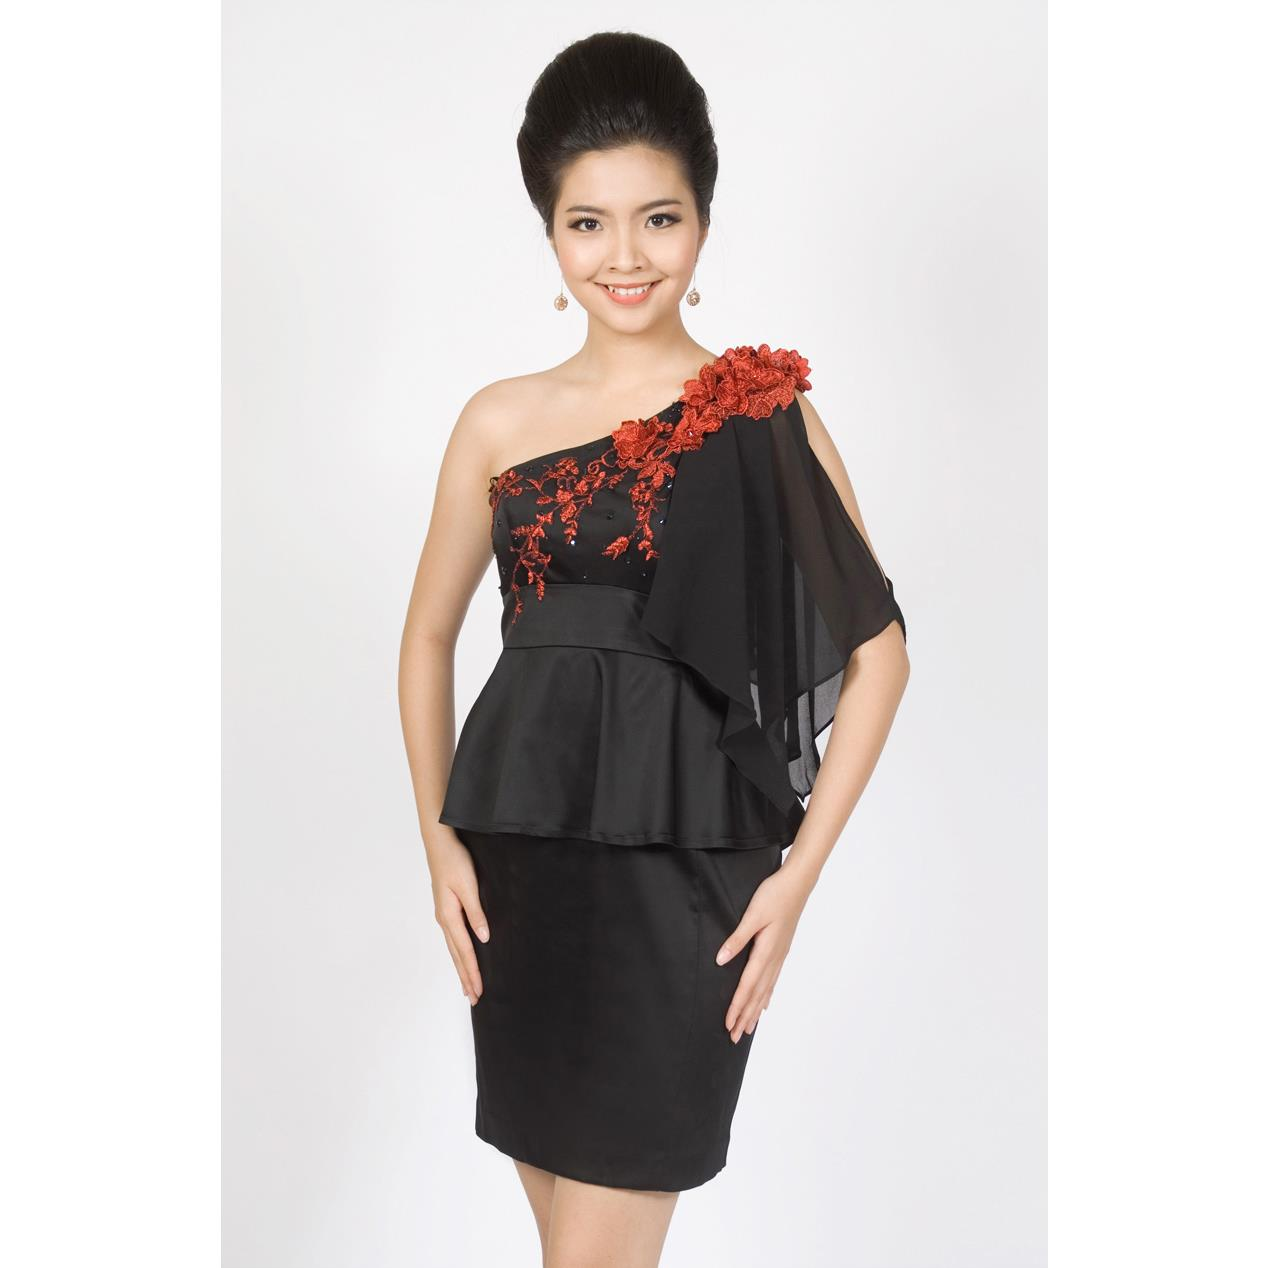 Đầm Cooktail - DRCK0059_04